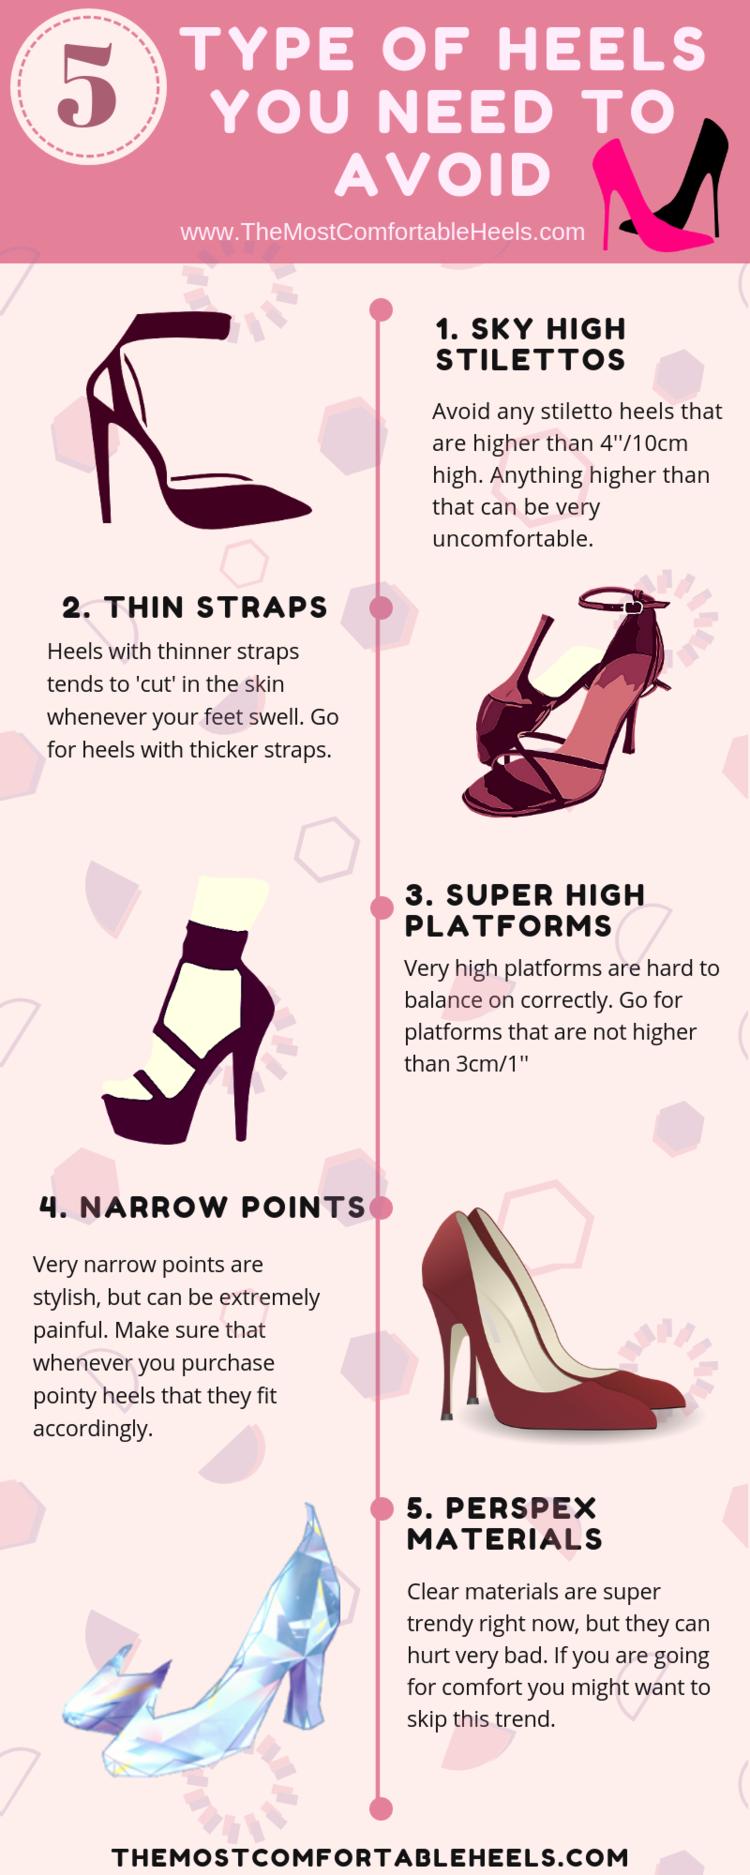 76938359688 5-type-of-heels-to-avoid